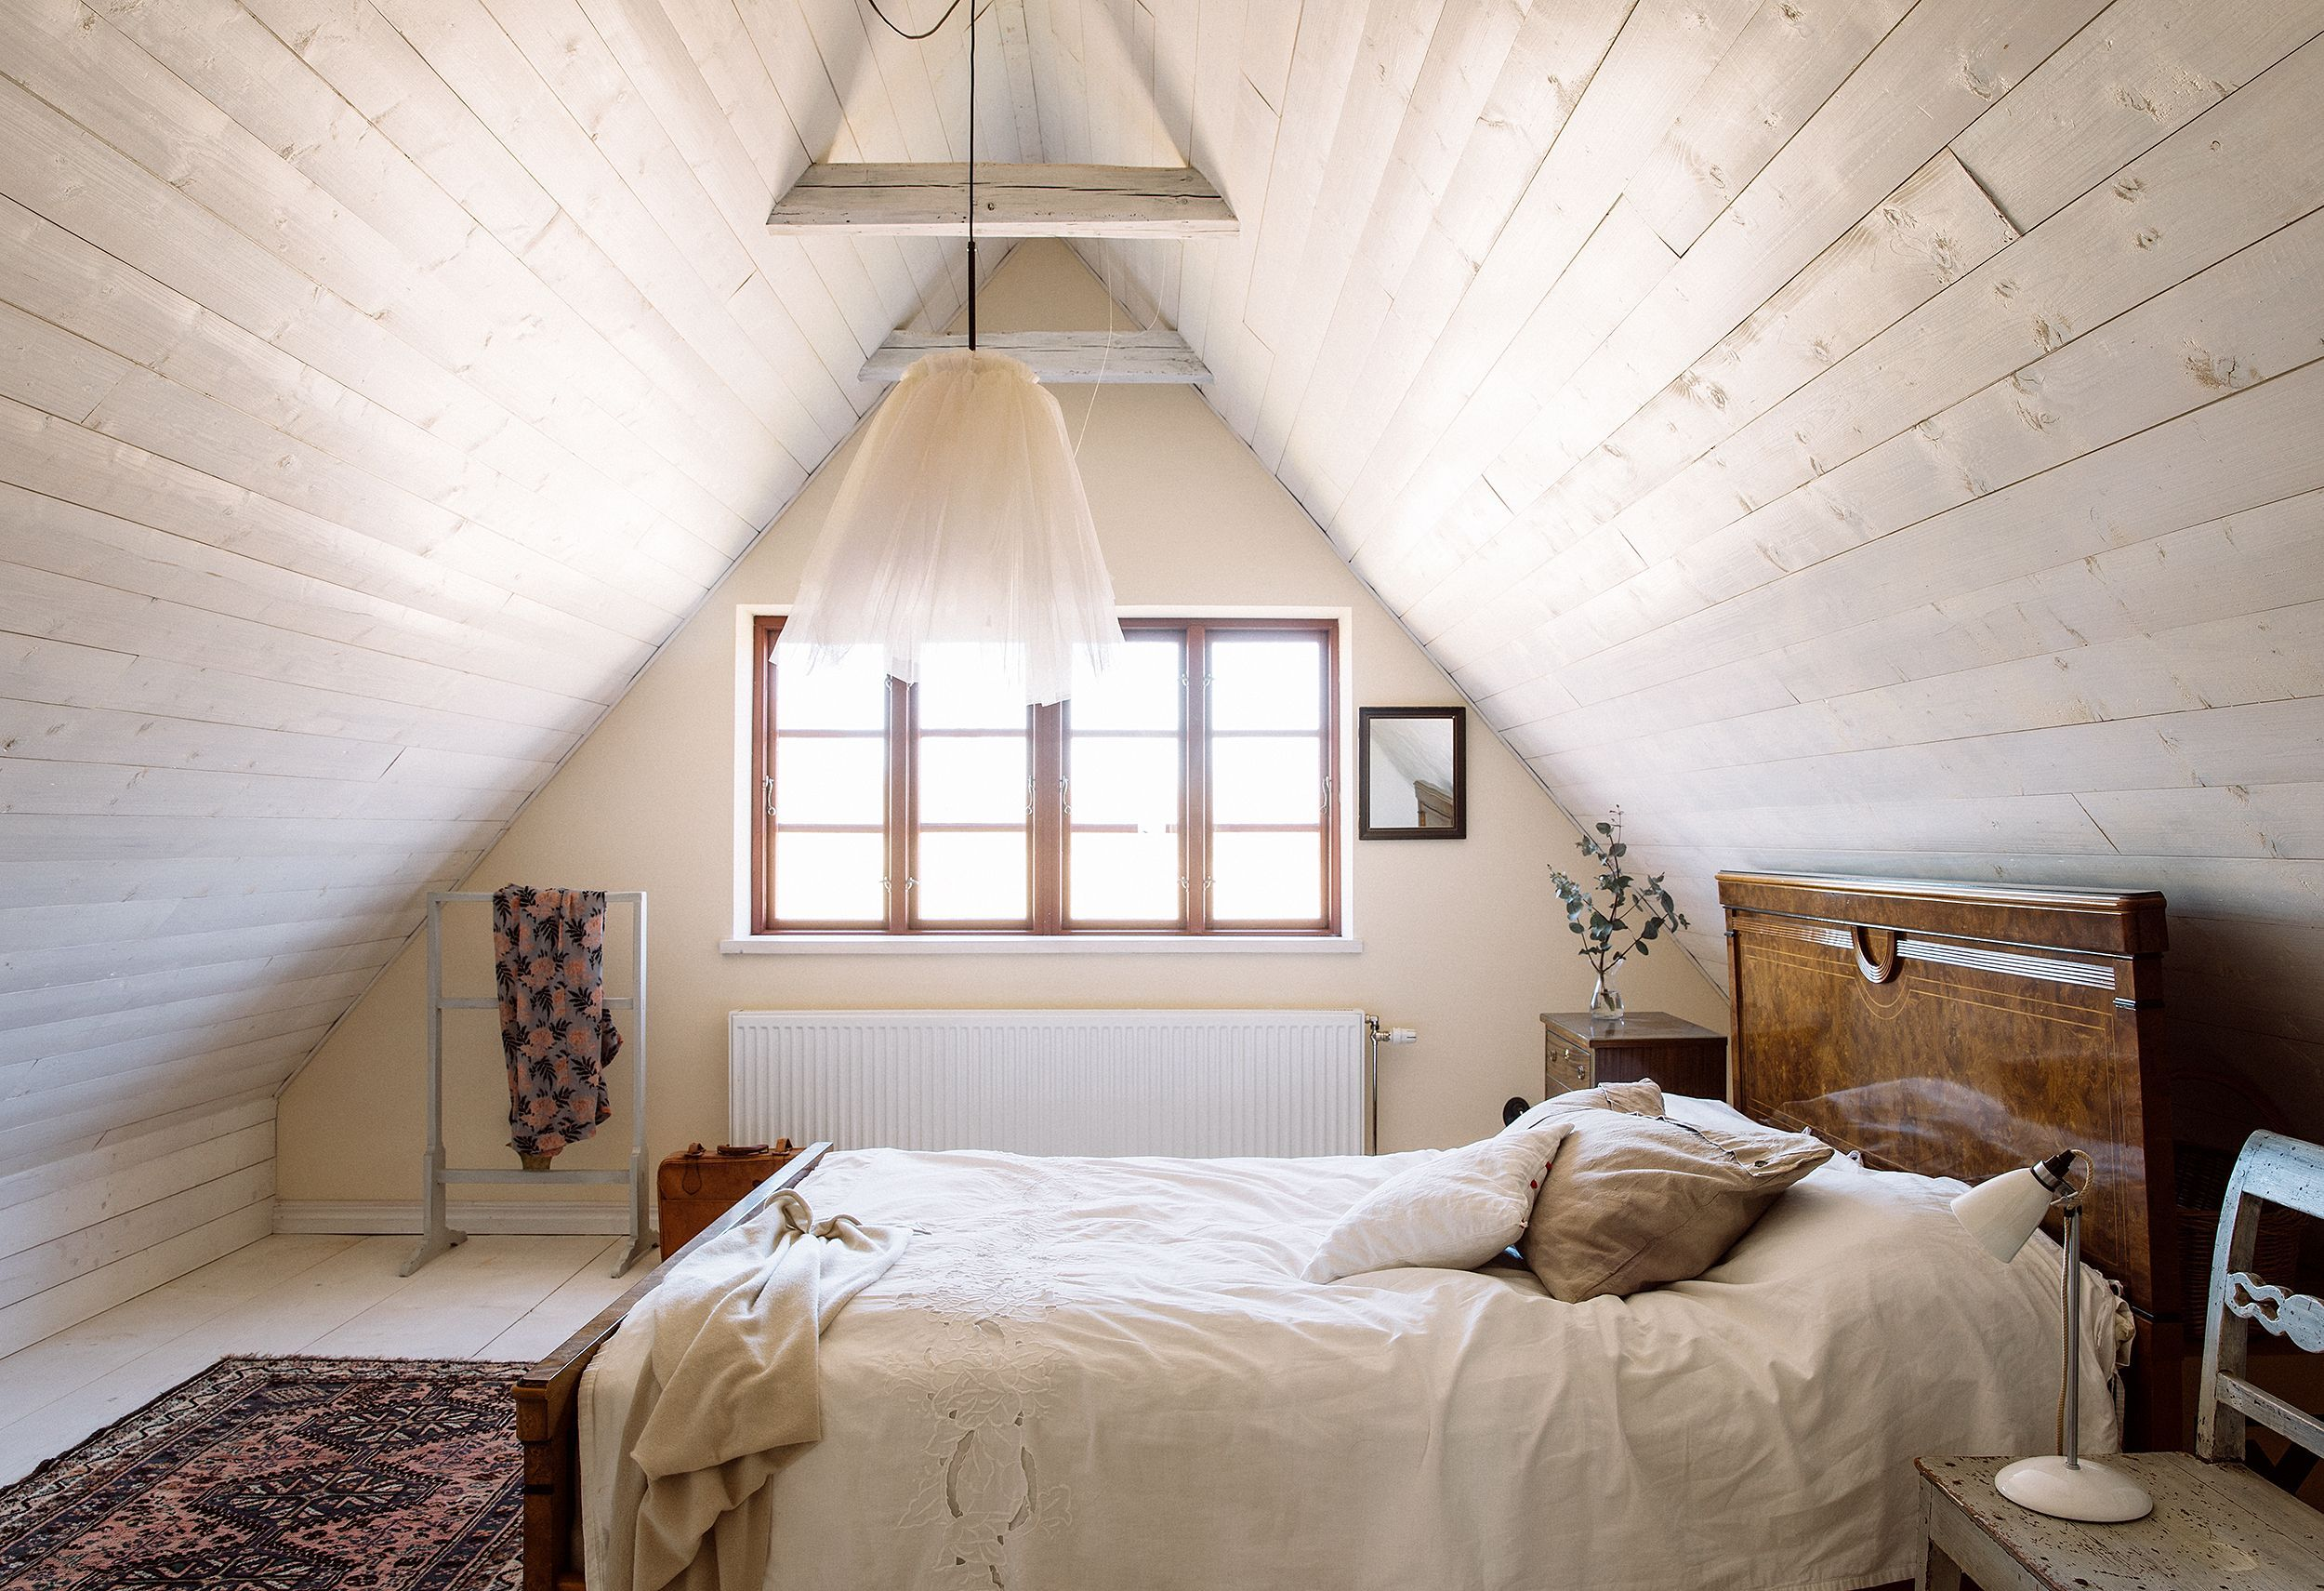 Low Ceiling Attic Bedroom Ideas 2021